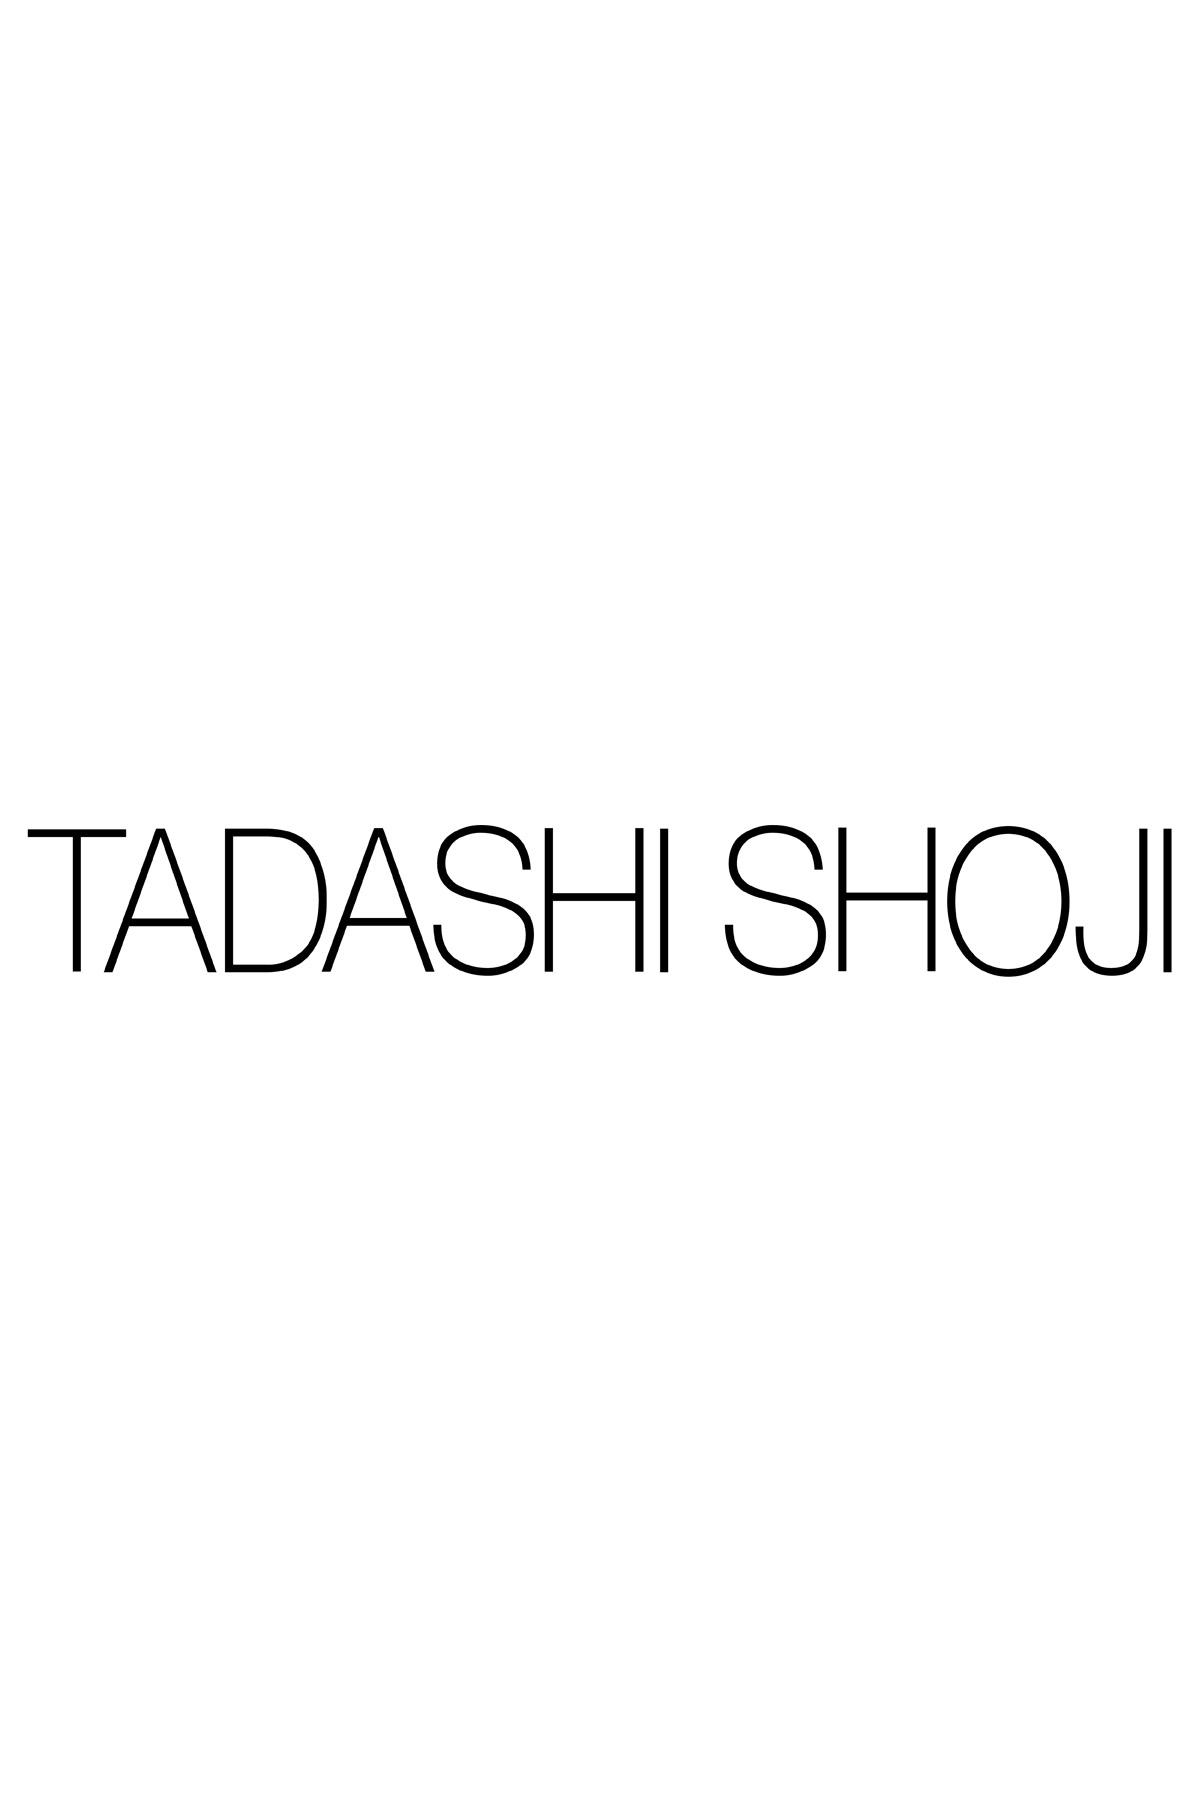 Tadashi Shoji Plus Size Detail - Ariana Dress